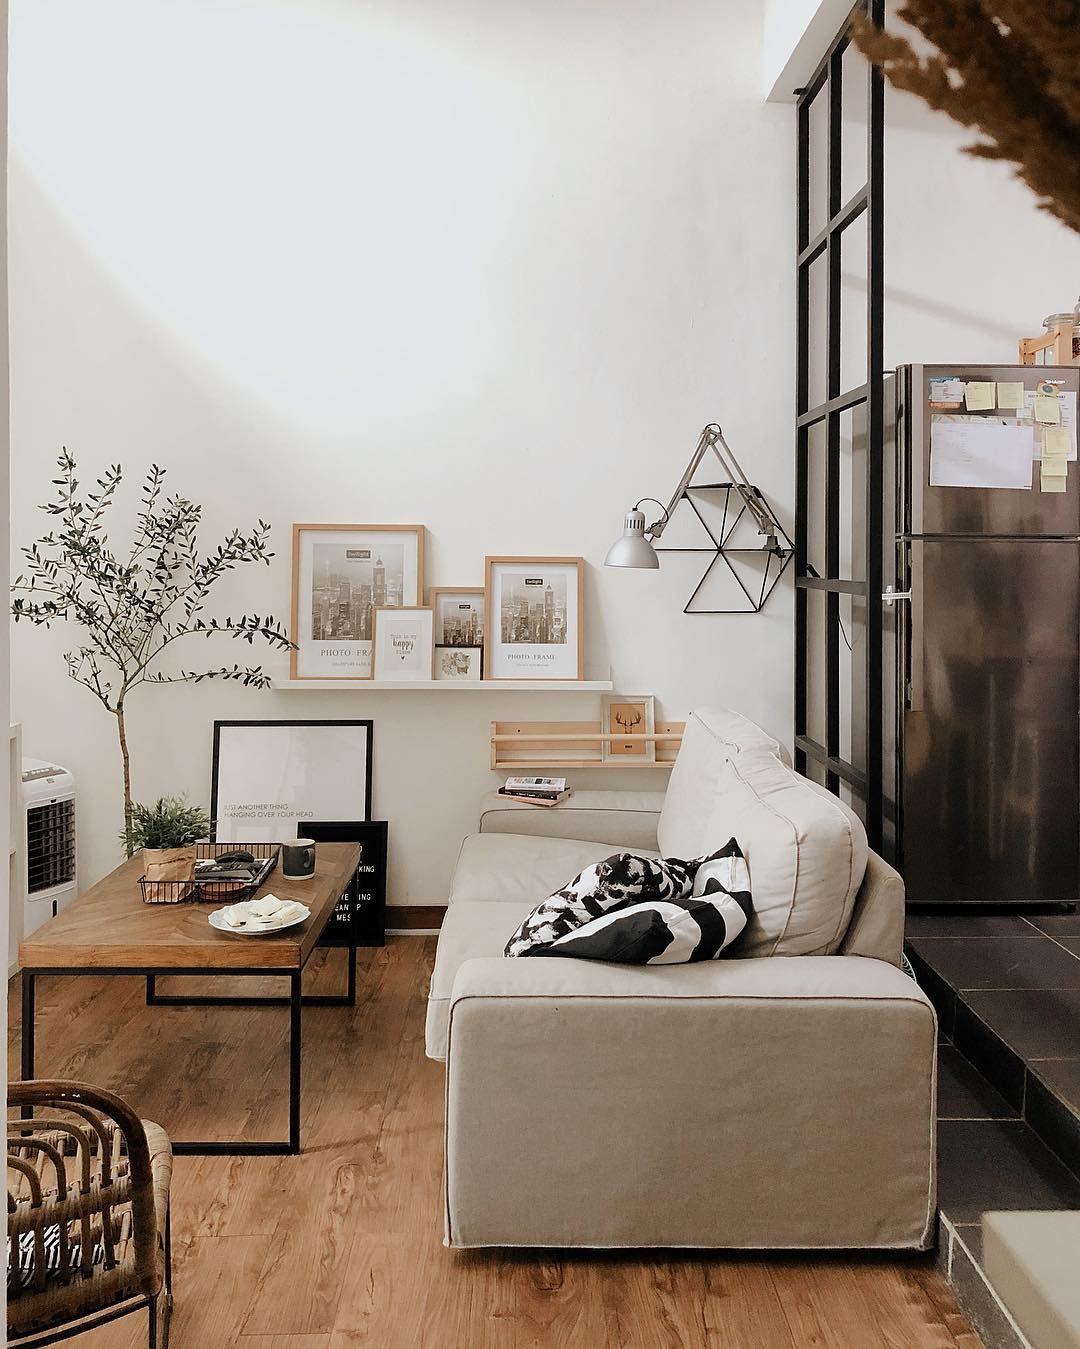 Desain Inspirasi Interior Ruang Keluarga Yang Dipadu Dengan Gaya Scandinavian Dan Gaya Industrial Inspirasi Desain Ide Dekorasi Rumah Interior Ruang Keluarga